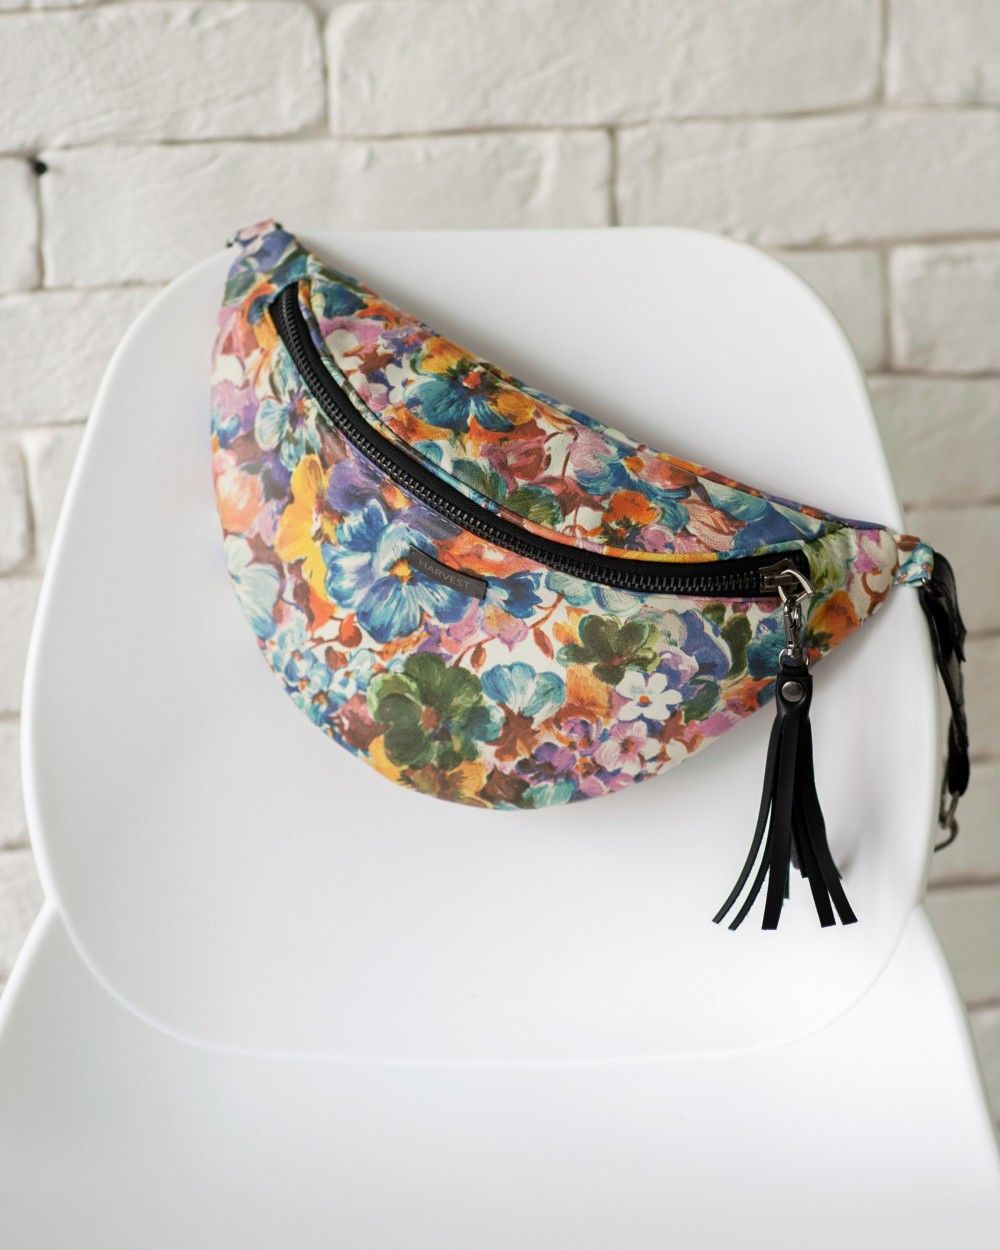 "Женская поясная сумка ""MOLLY"" принт цветы, на 2л, бананка, повседневная, спортивная, натуральная кожа, Harvest"